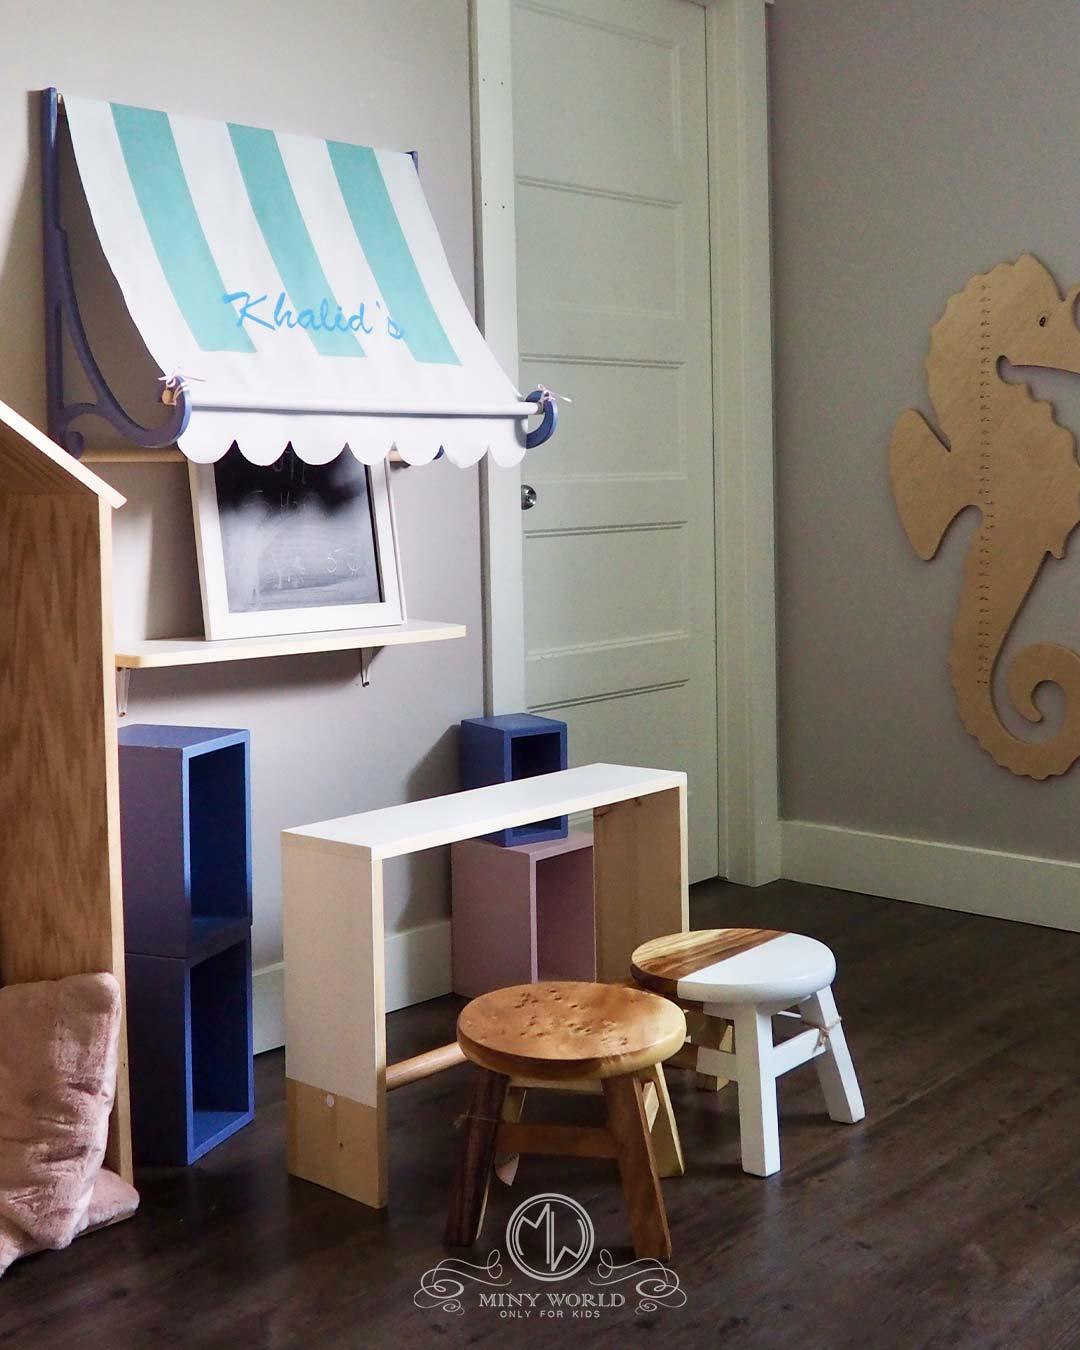 Noah_playroom_interior_design_minyworld_6